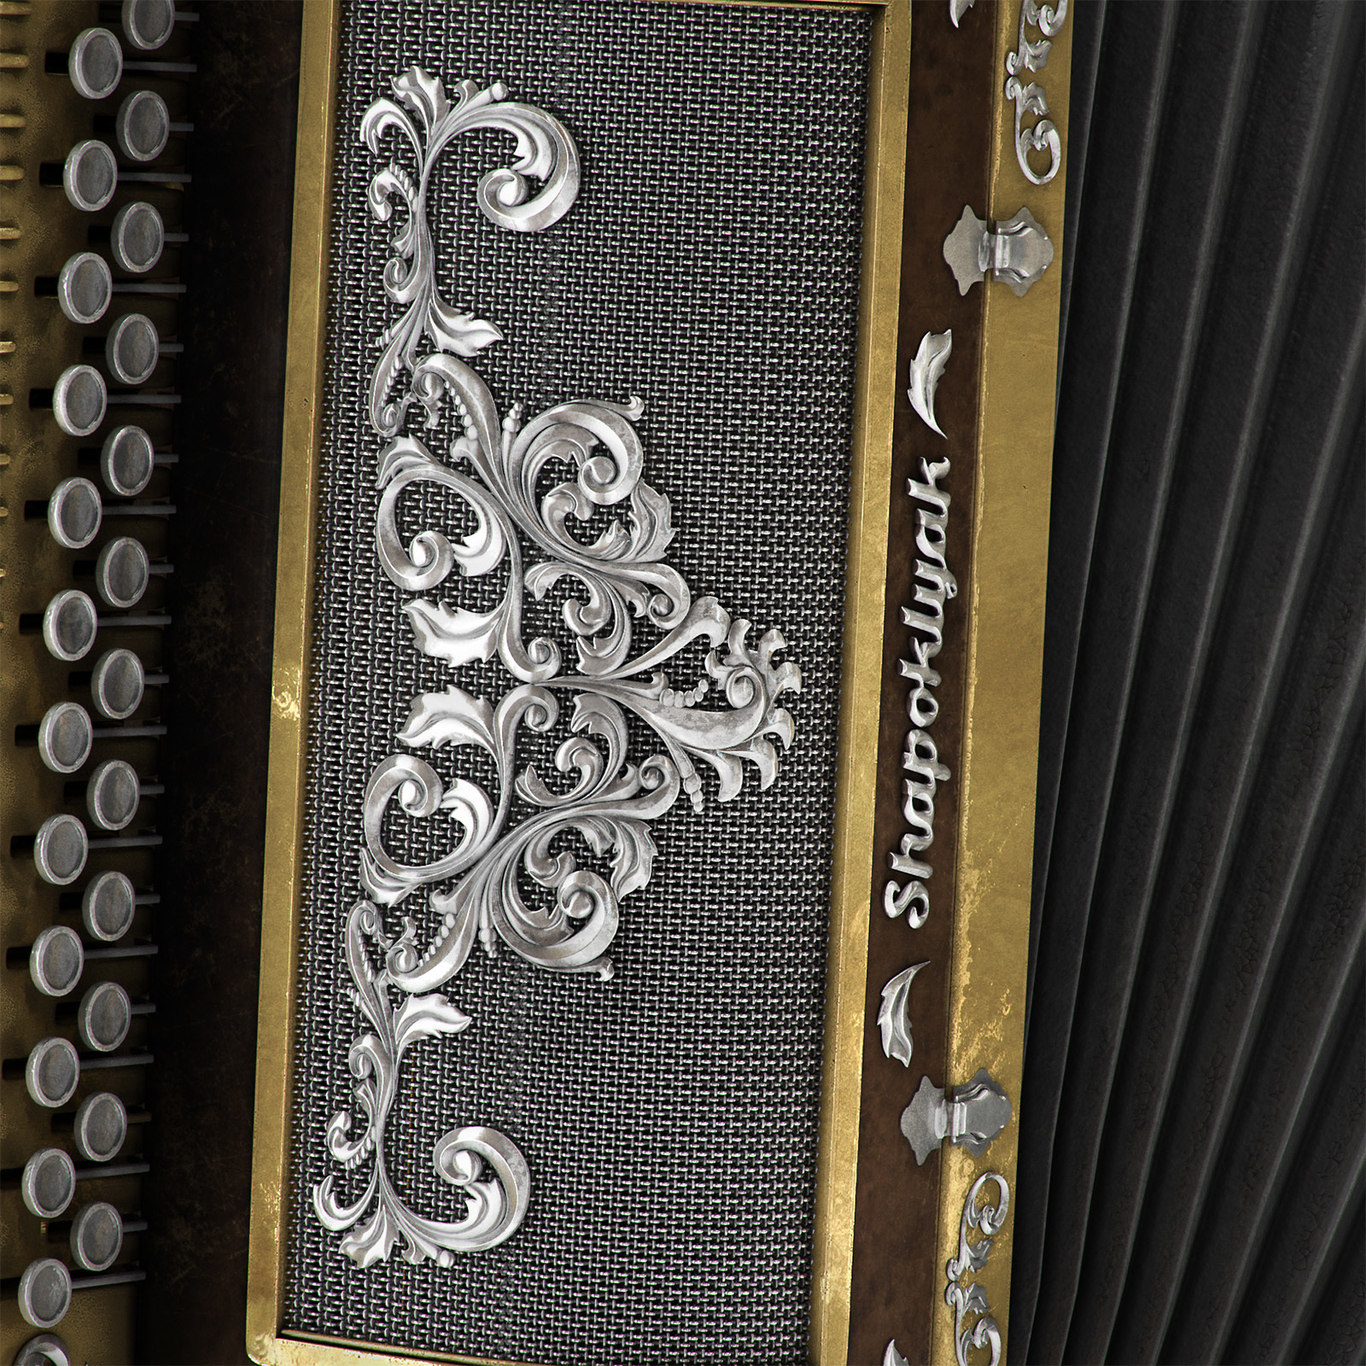 MrMusiCroman by Vlad-zorg | Steampunk | 3D | CGSociety